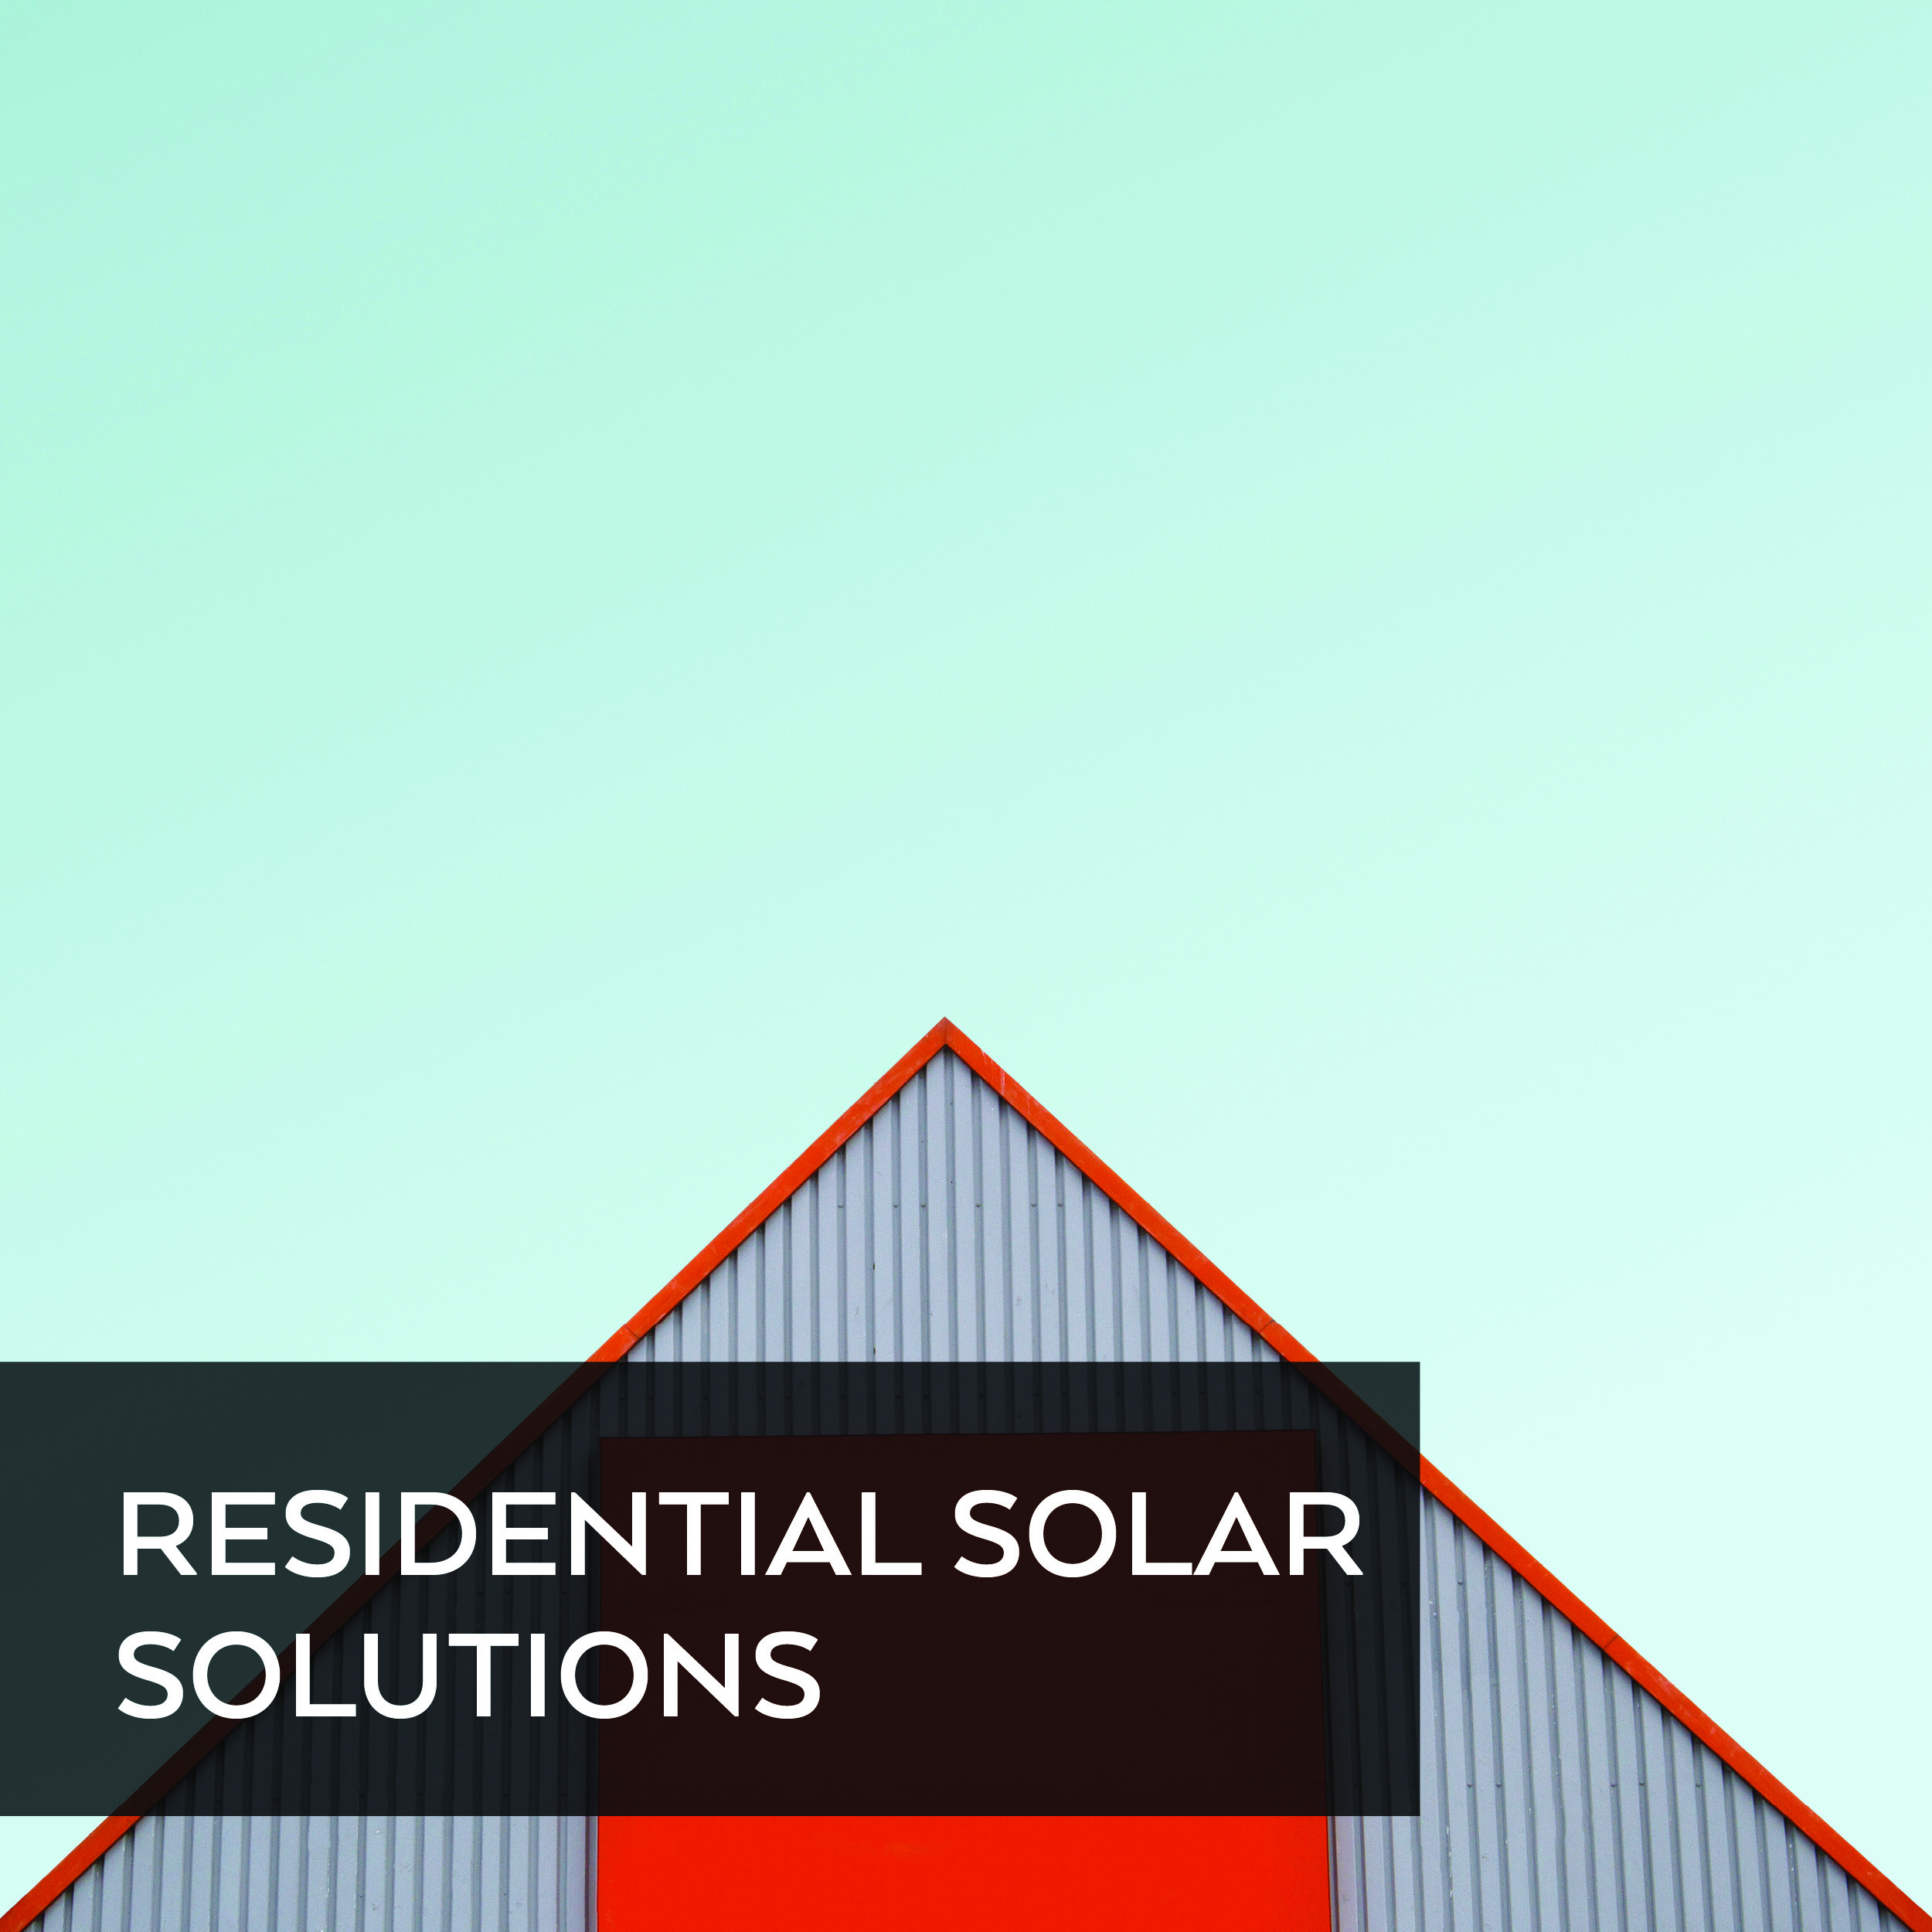 residential_solar_services_optimus_mount_dora.jpg